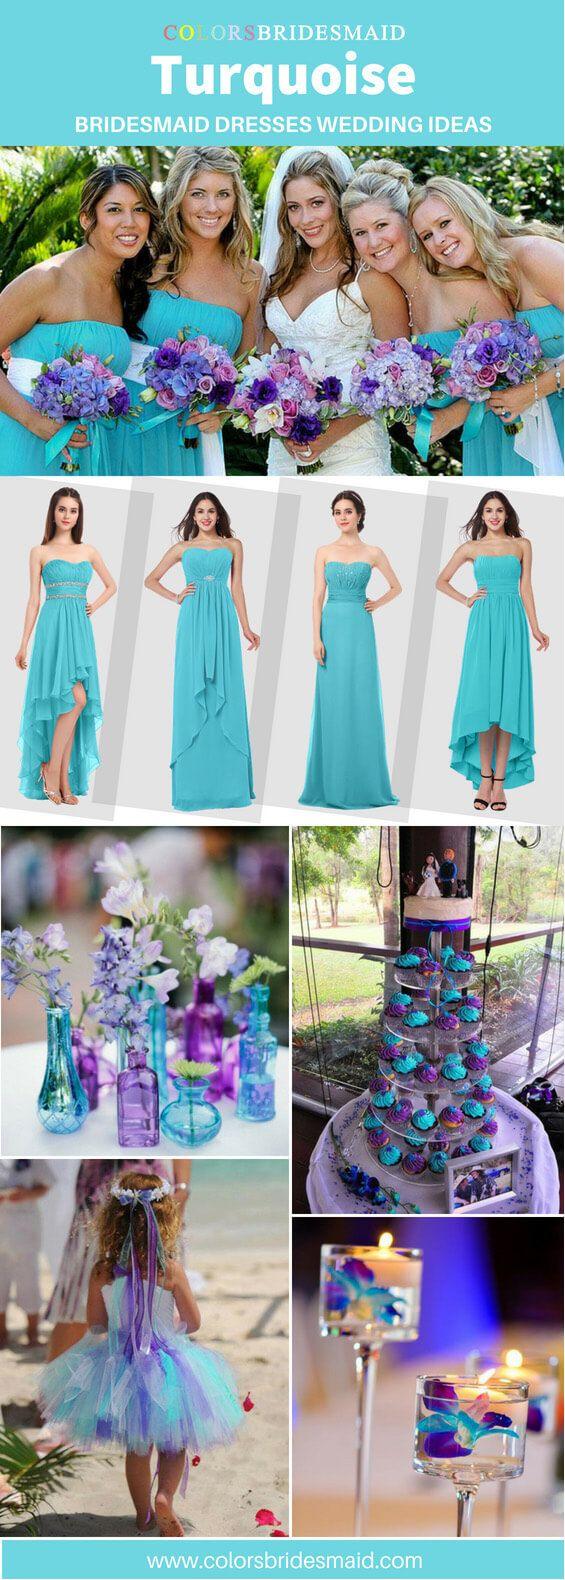 Turquoise Bridesmaid Dresses Turquoise Bridesmaid Dresses